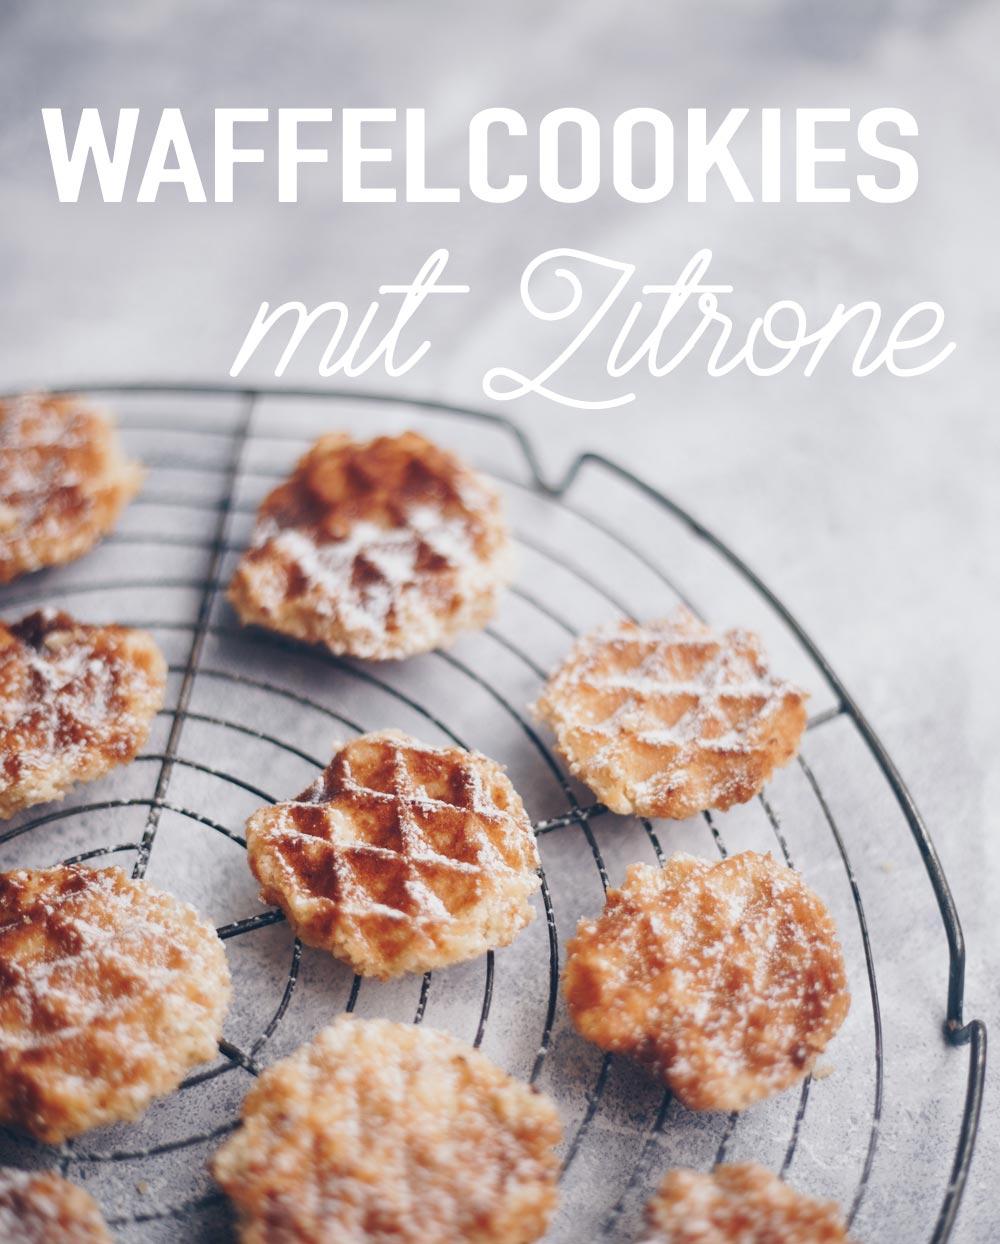 Simple Waffelcookies mit Zitrone backen - einfache Rezeptidee